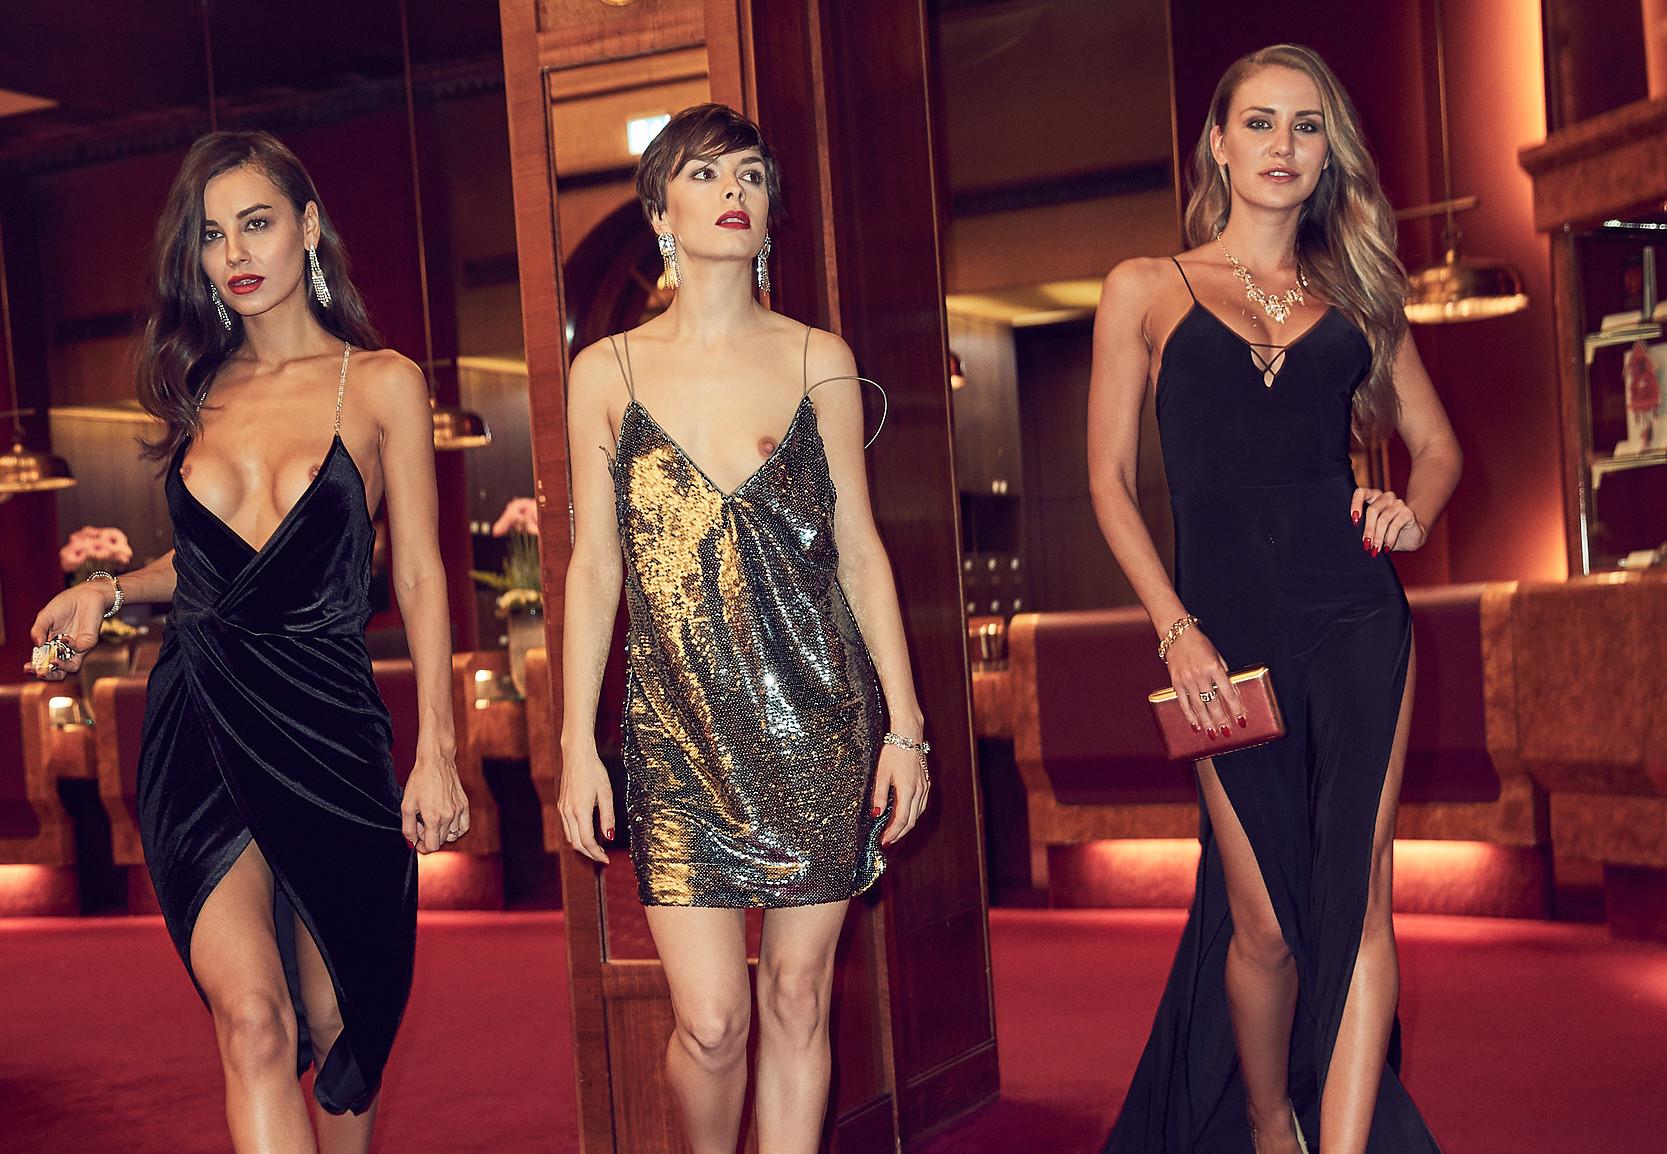 Veronika Klimovits, Julia Prokopy & Olivia Peltzer - Playmate des Jahres Top 3 2019 (part 3)